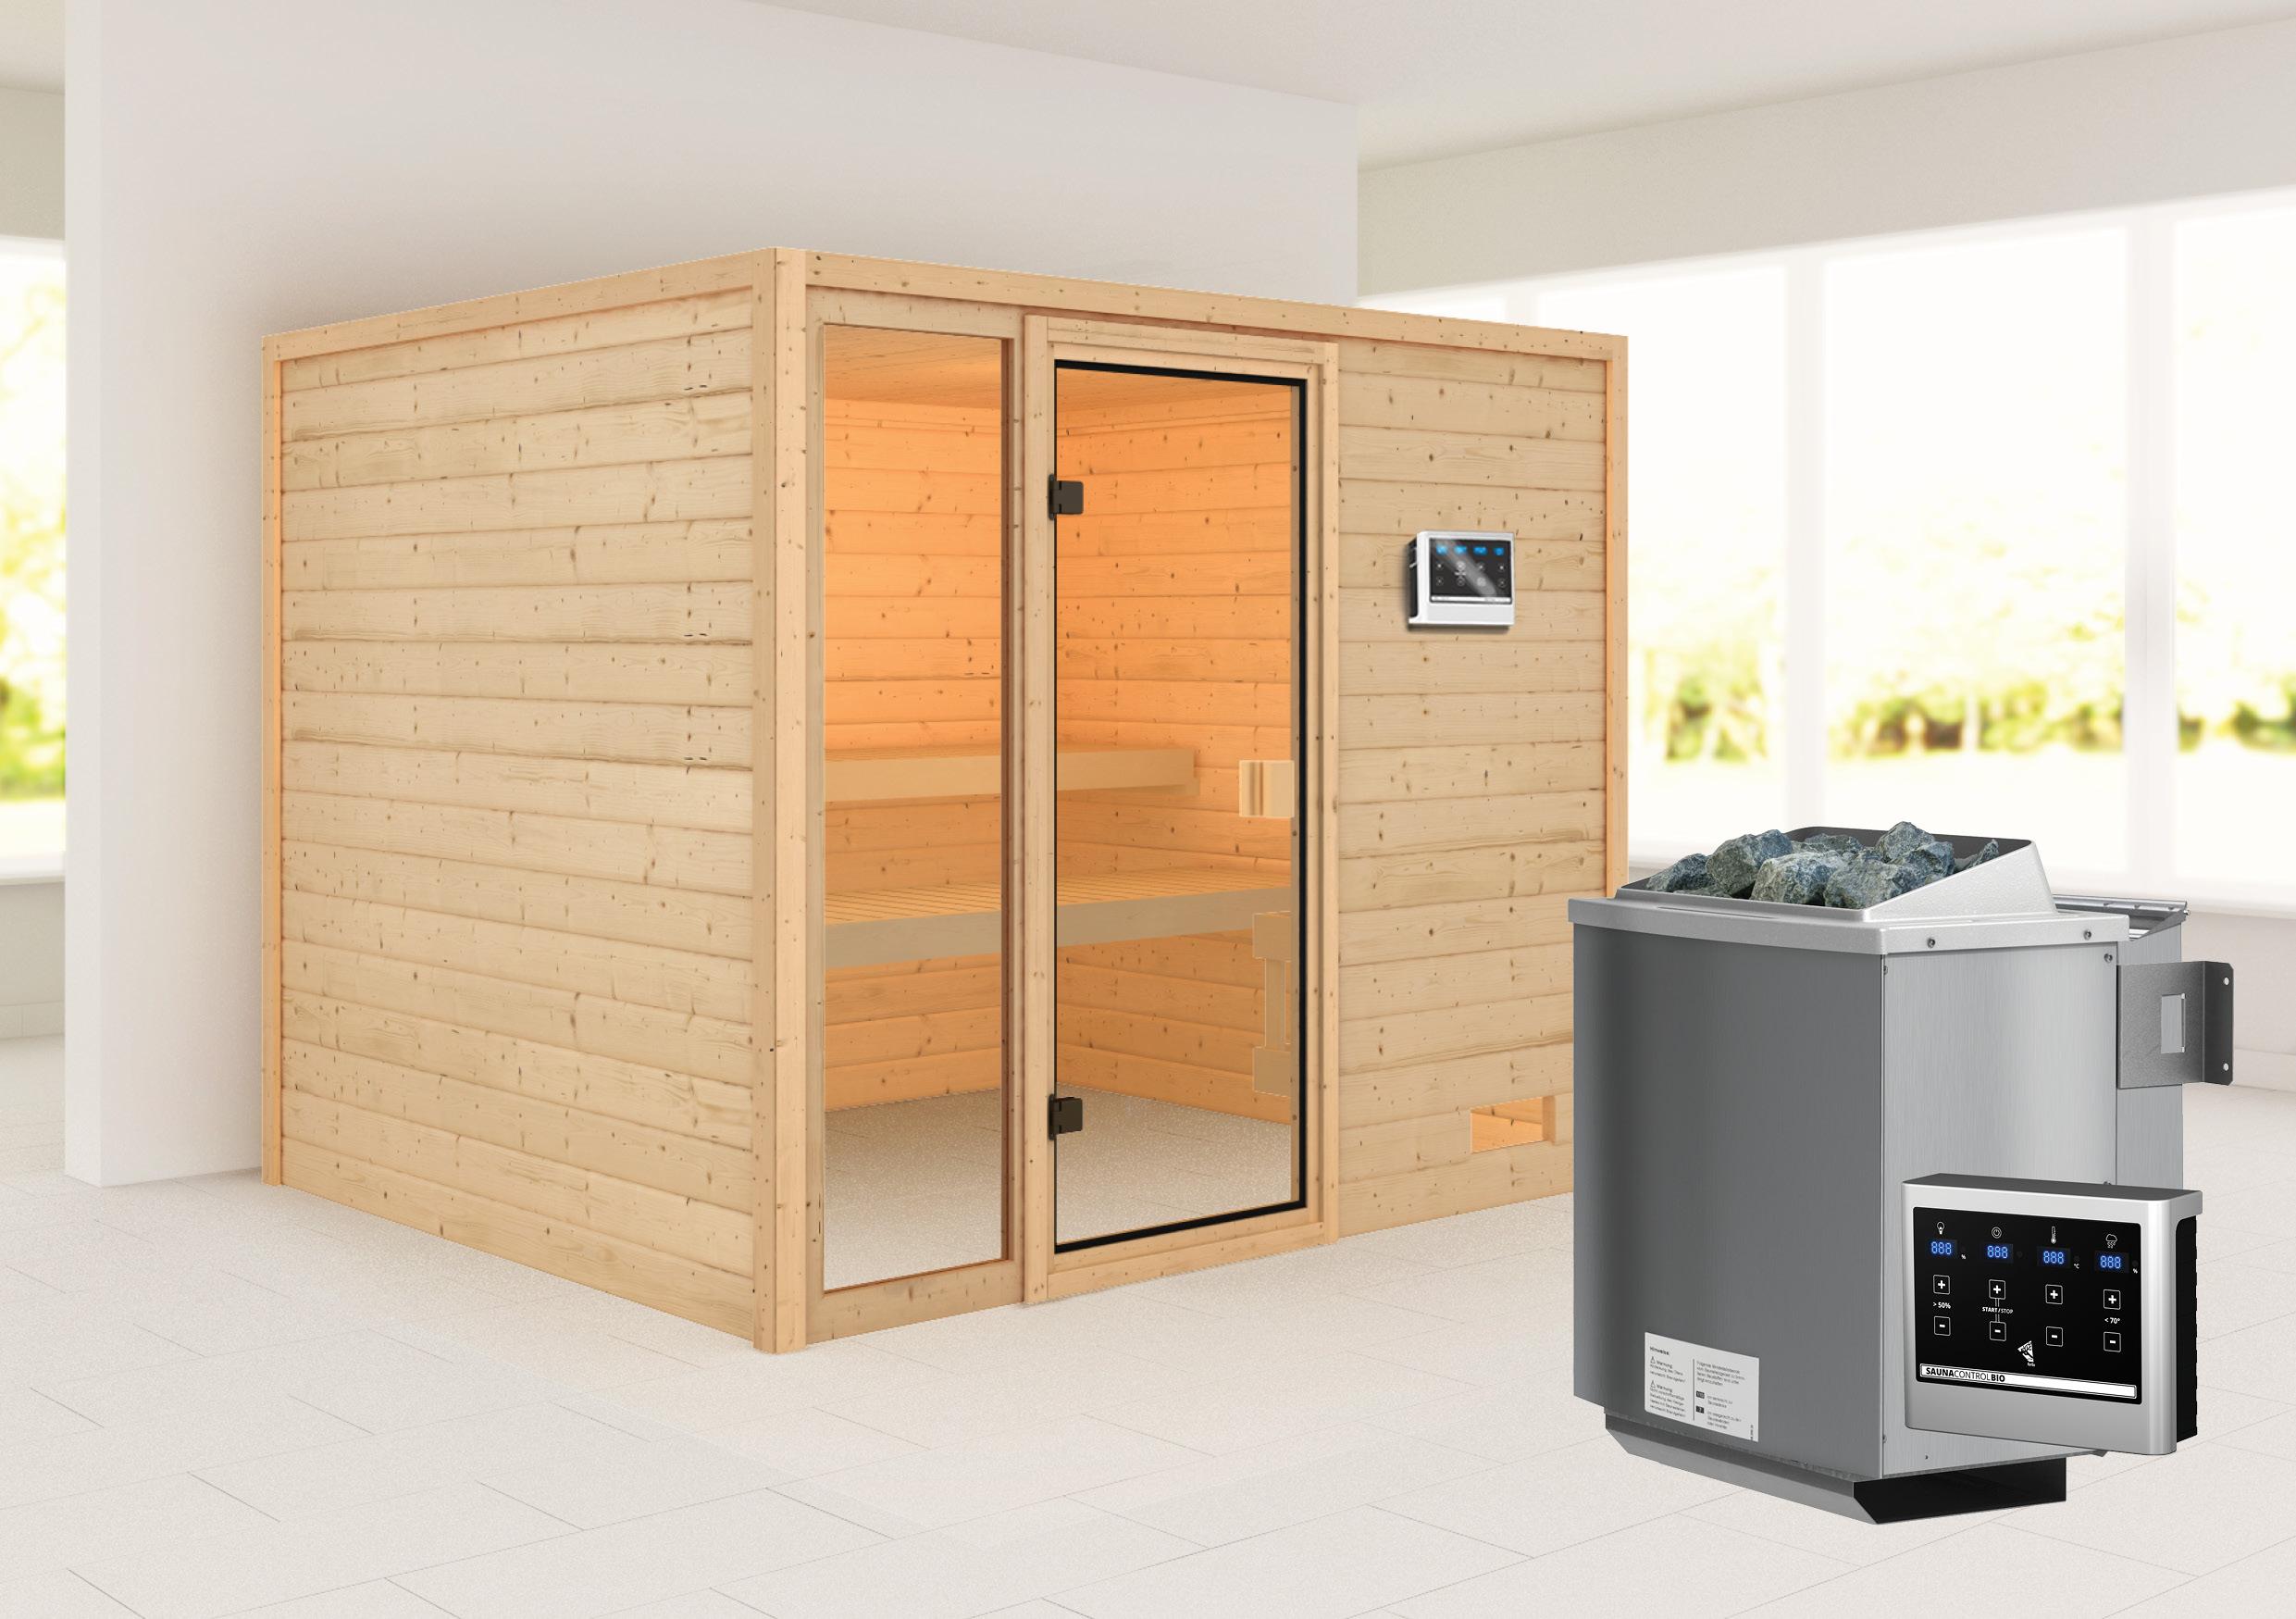 Woodfeeling Sauna Kiana 38mm Bio Saunaofen 9 kW extern Bild 1